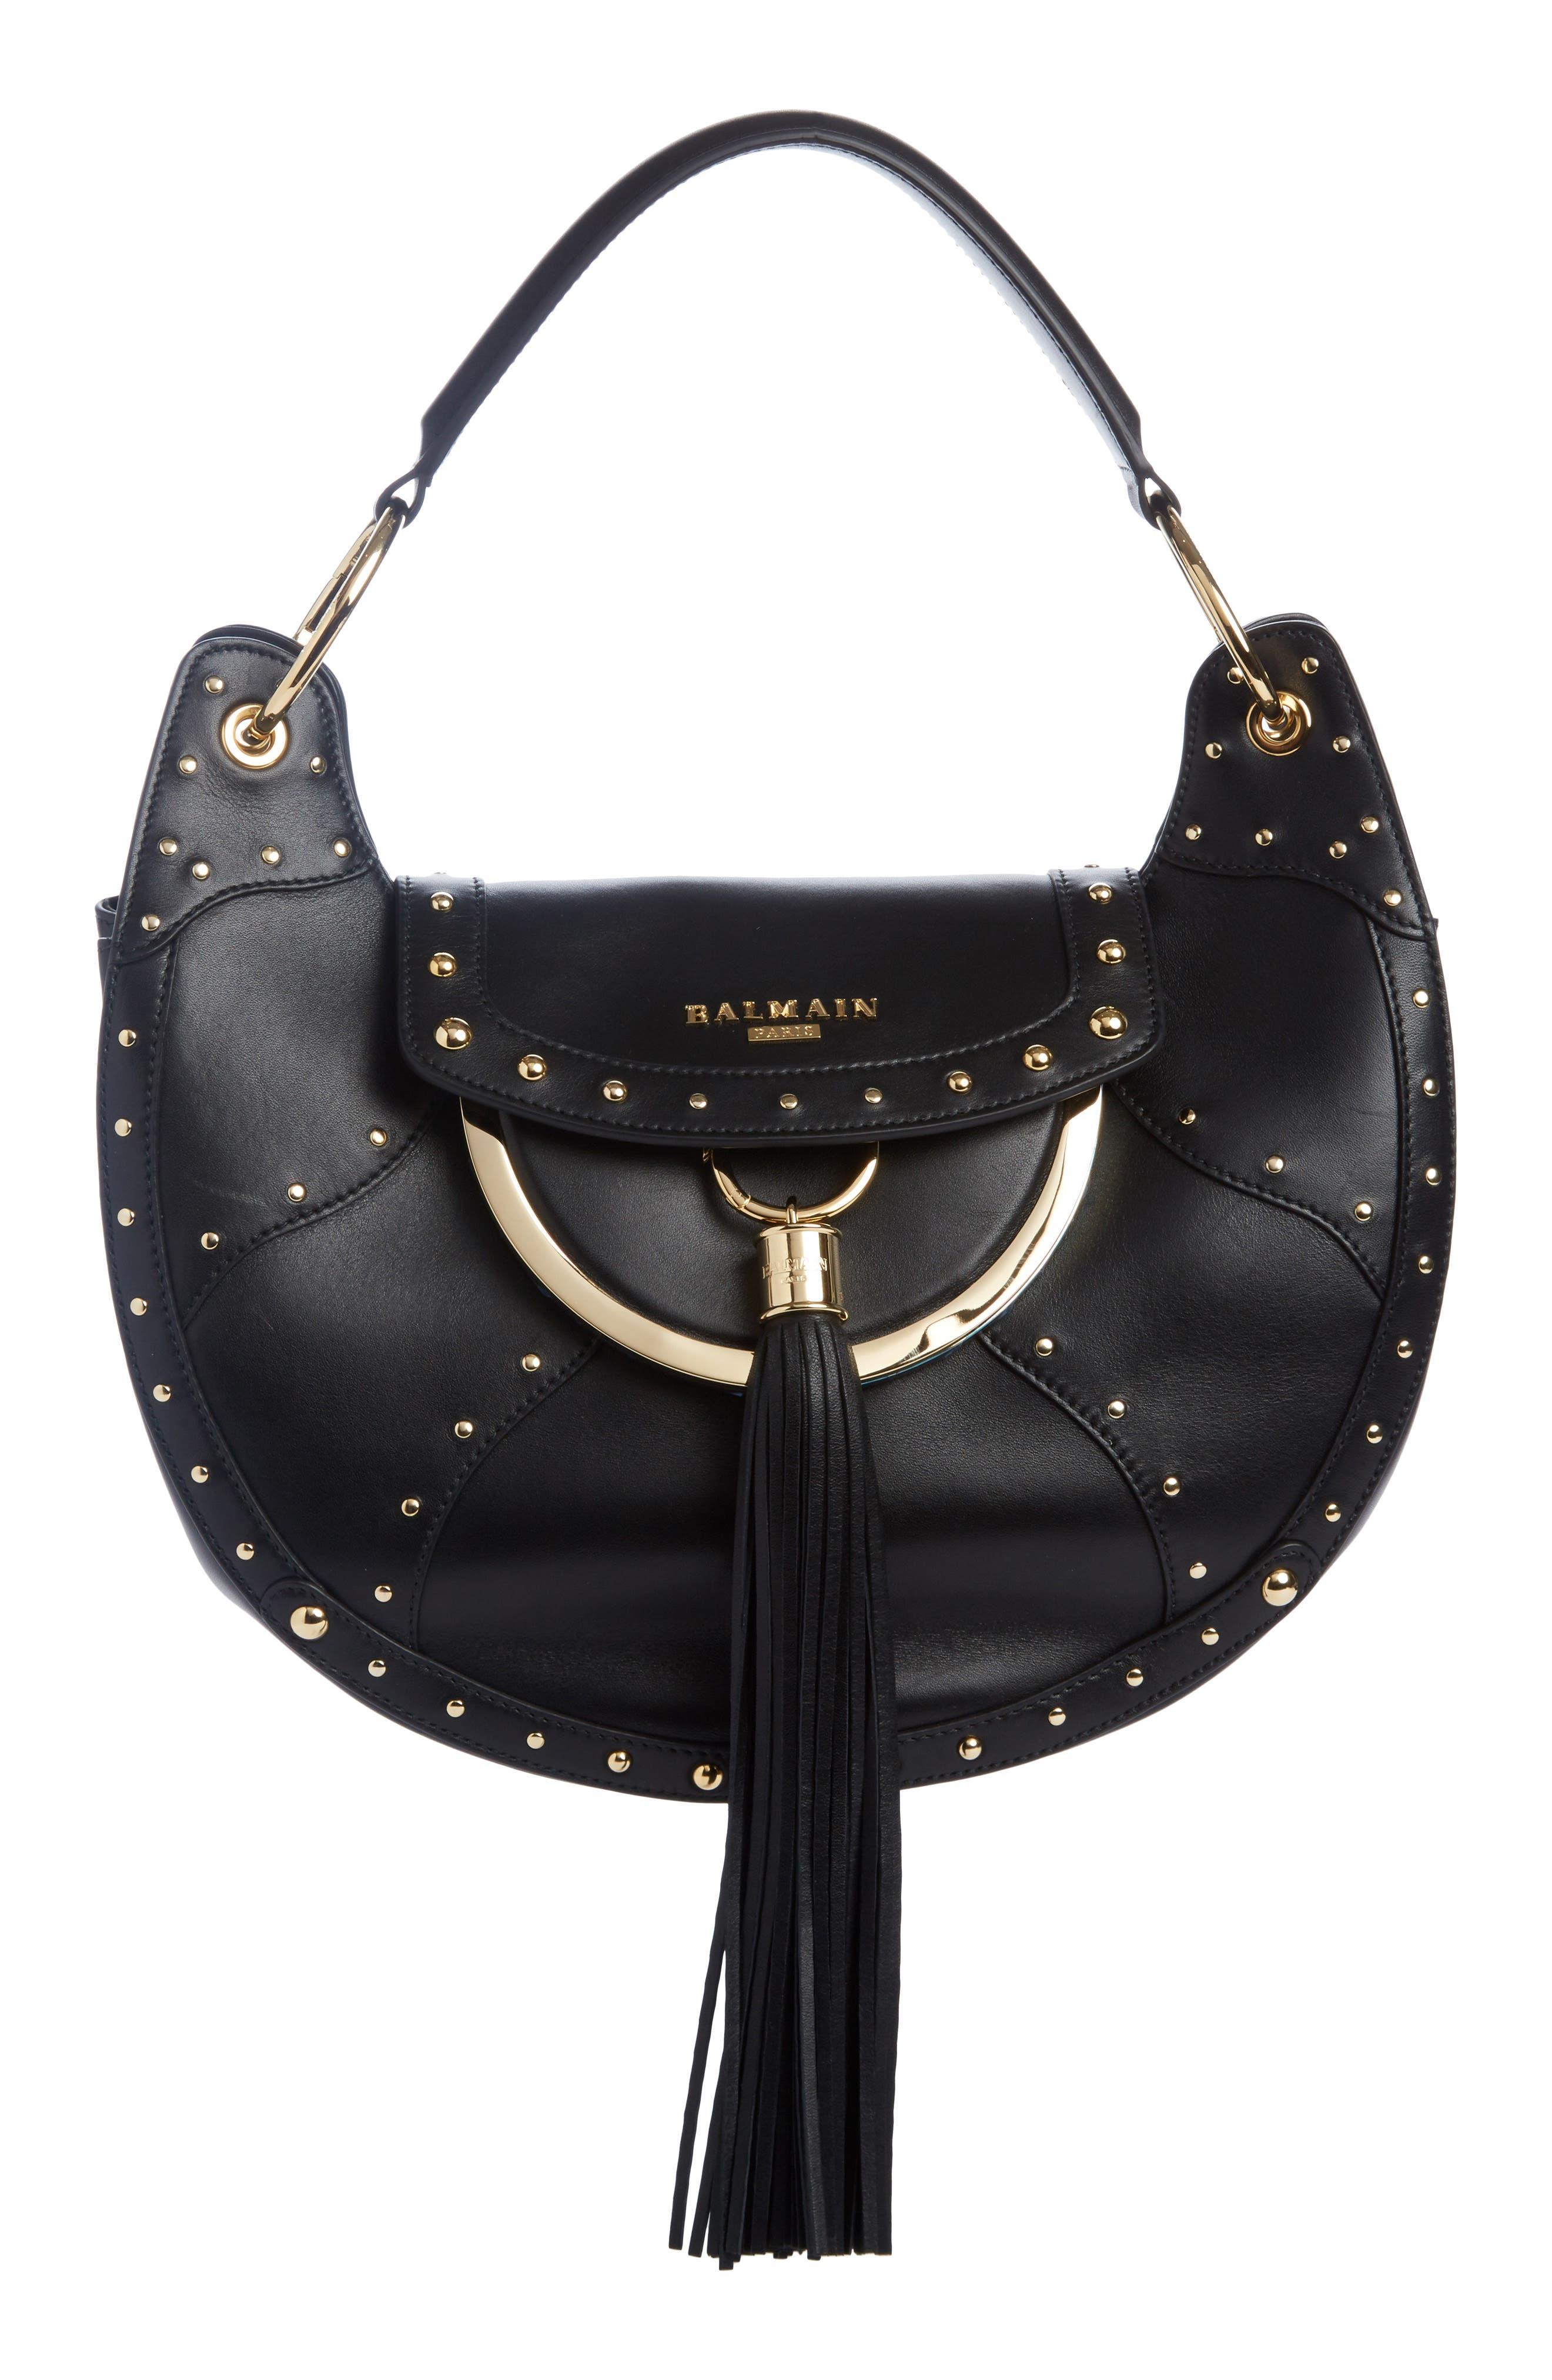 Main Image - Balmain Domaine Full Moon Leather Shoulder Bag